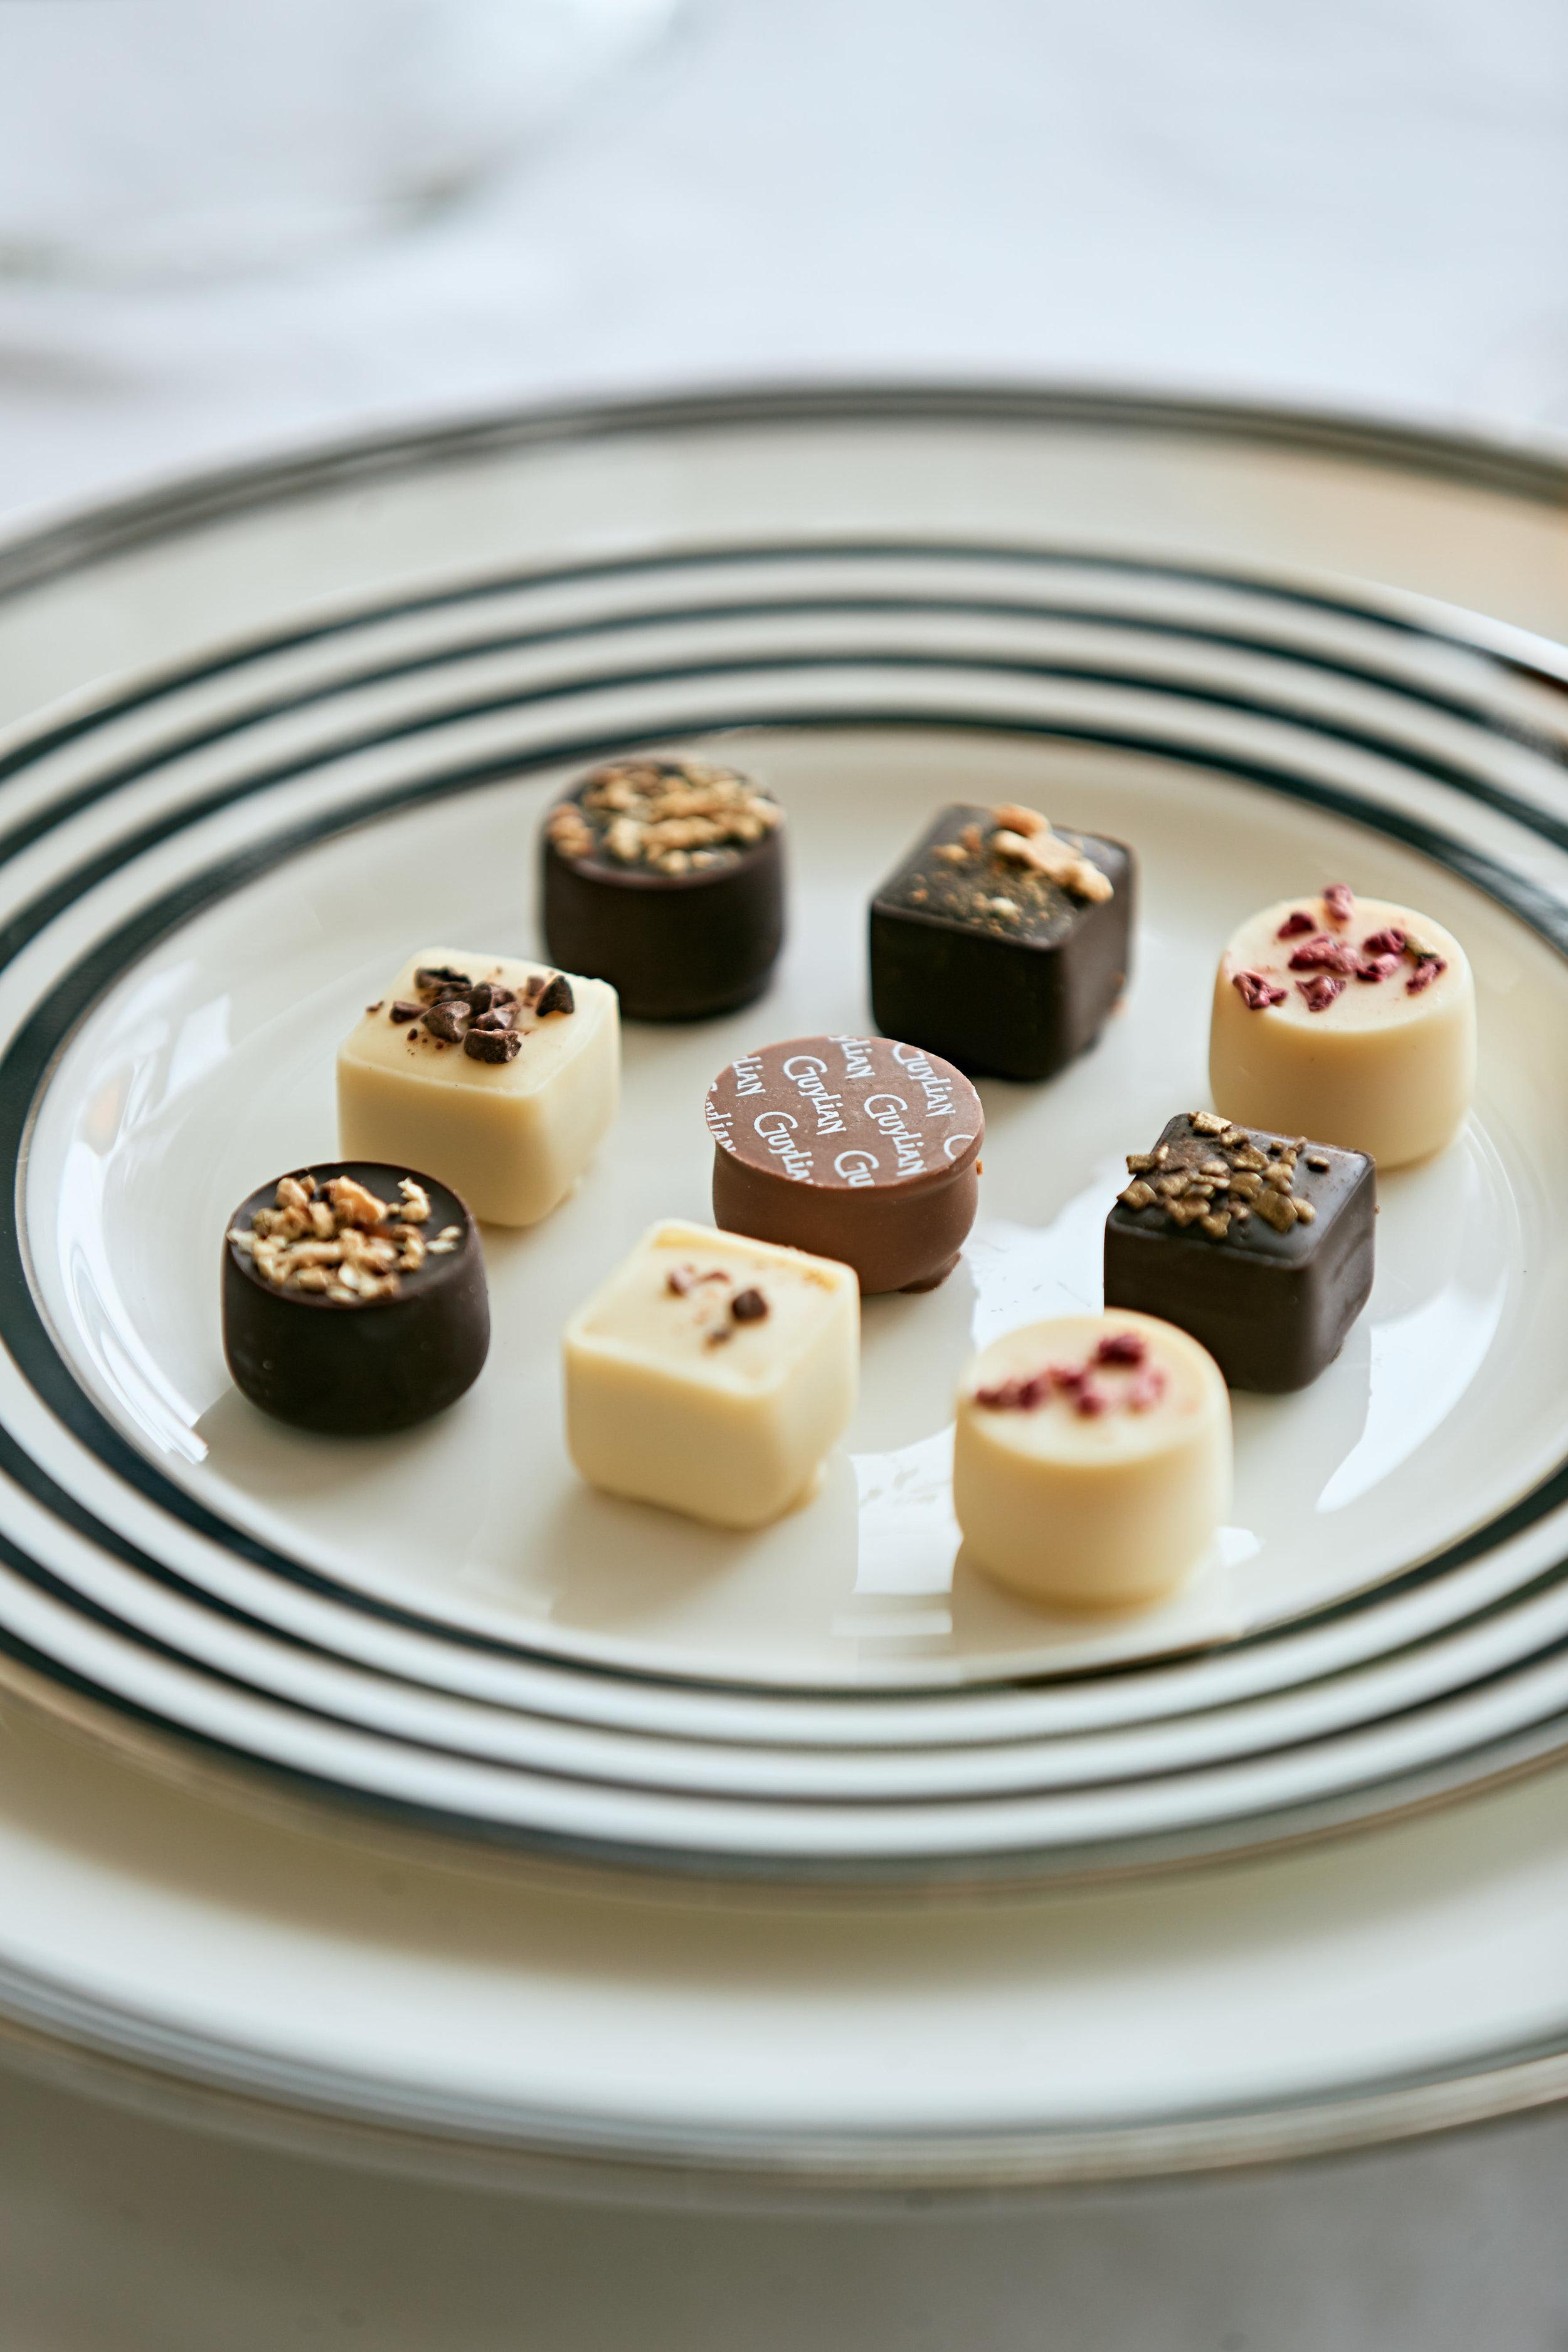 Guylian The Master's Selection Belguim chocolates